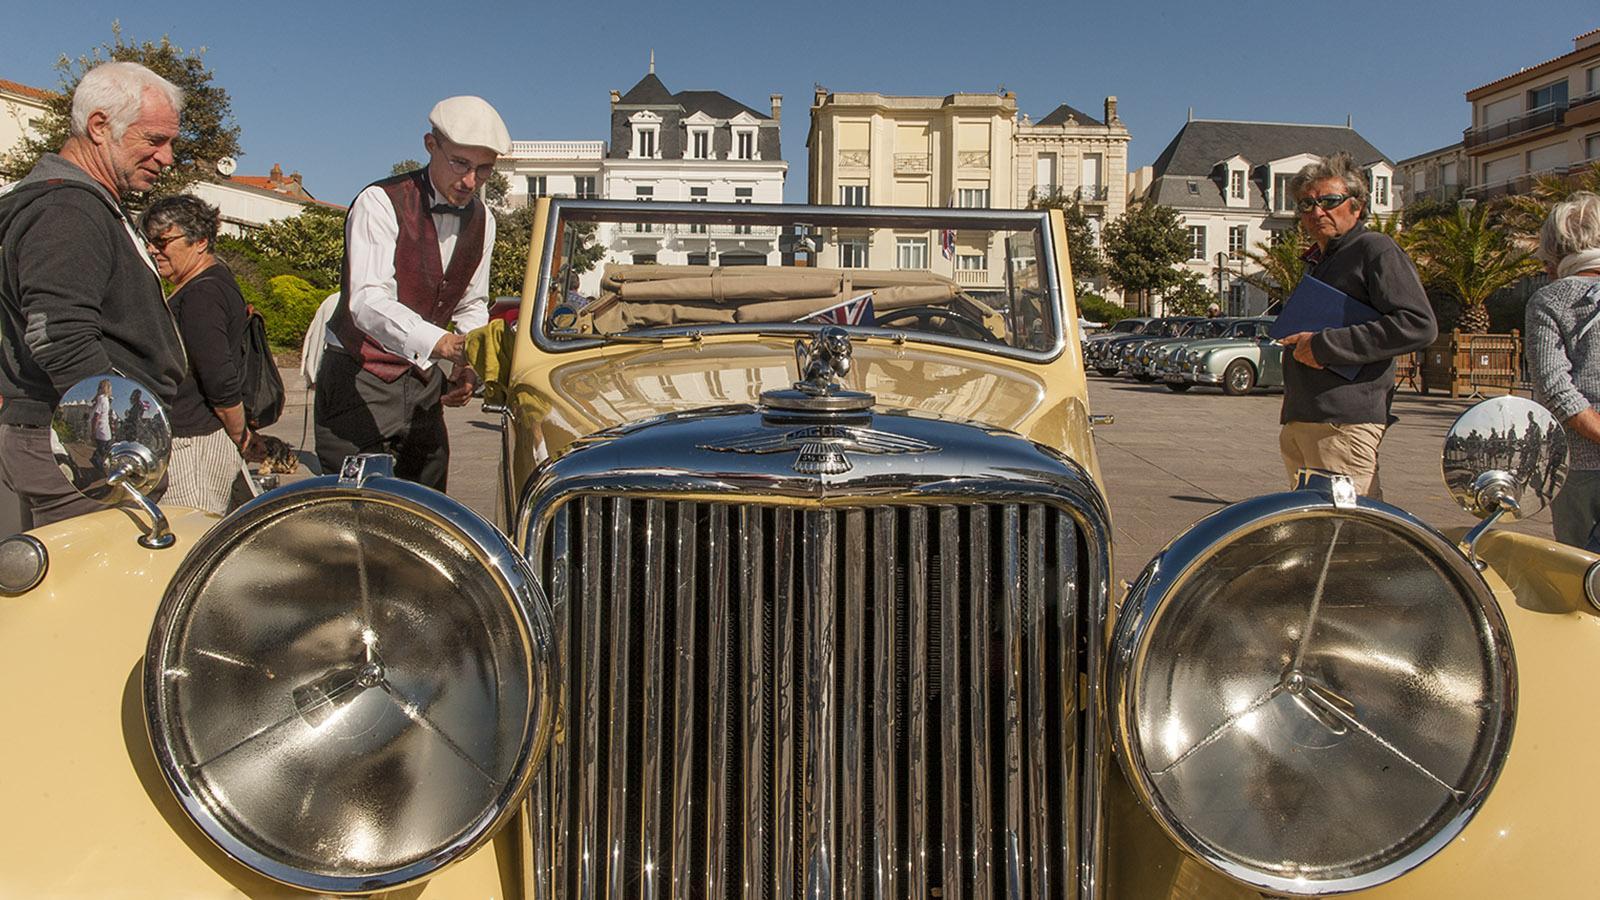 Sables d'Olonne: Parade derBelles Anglaises. Foto: Hilke Maunder